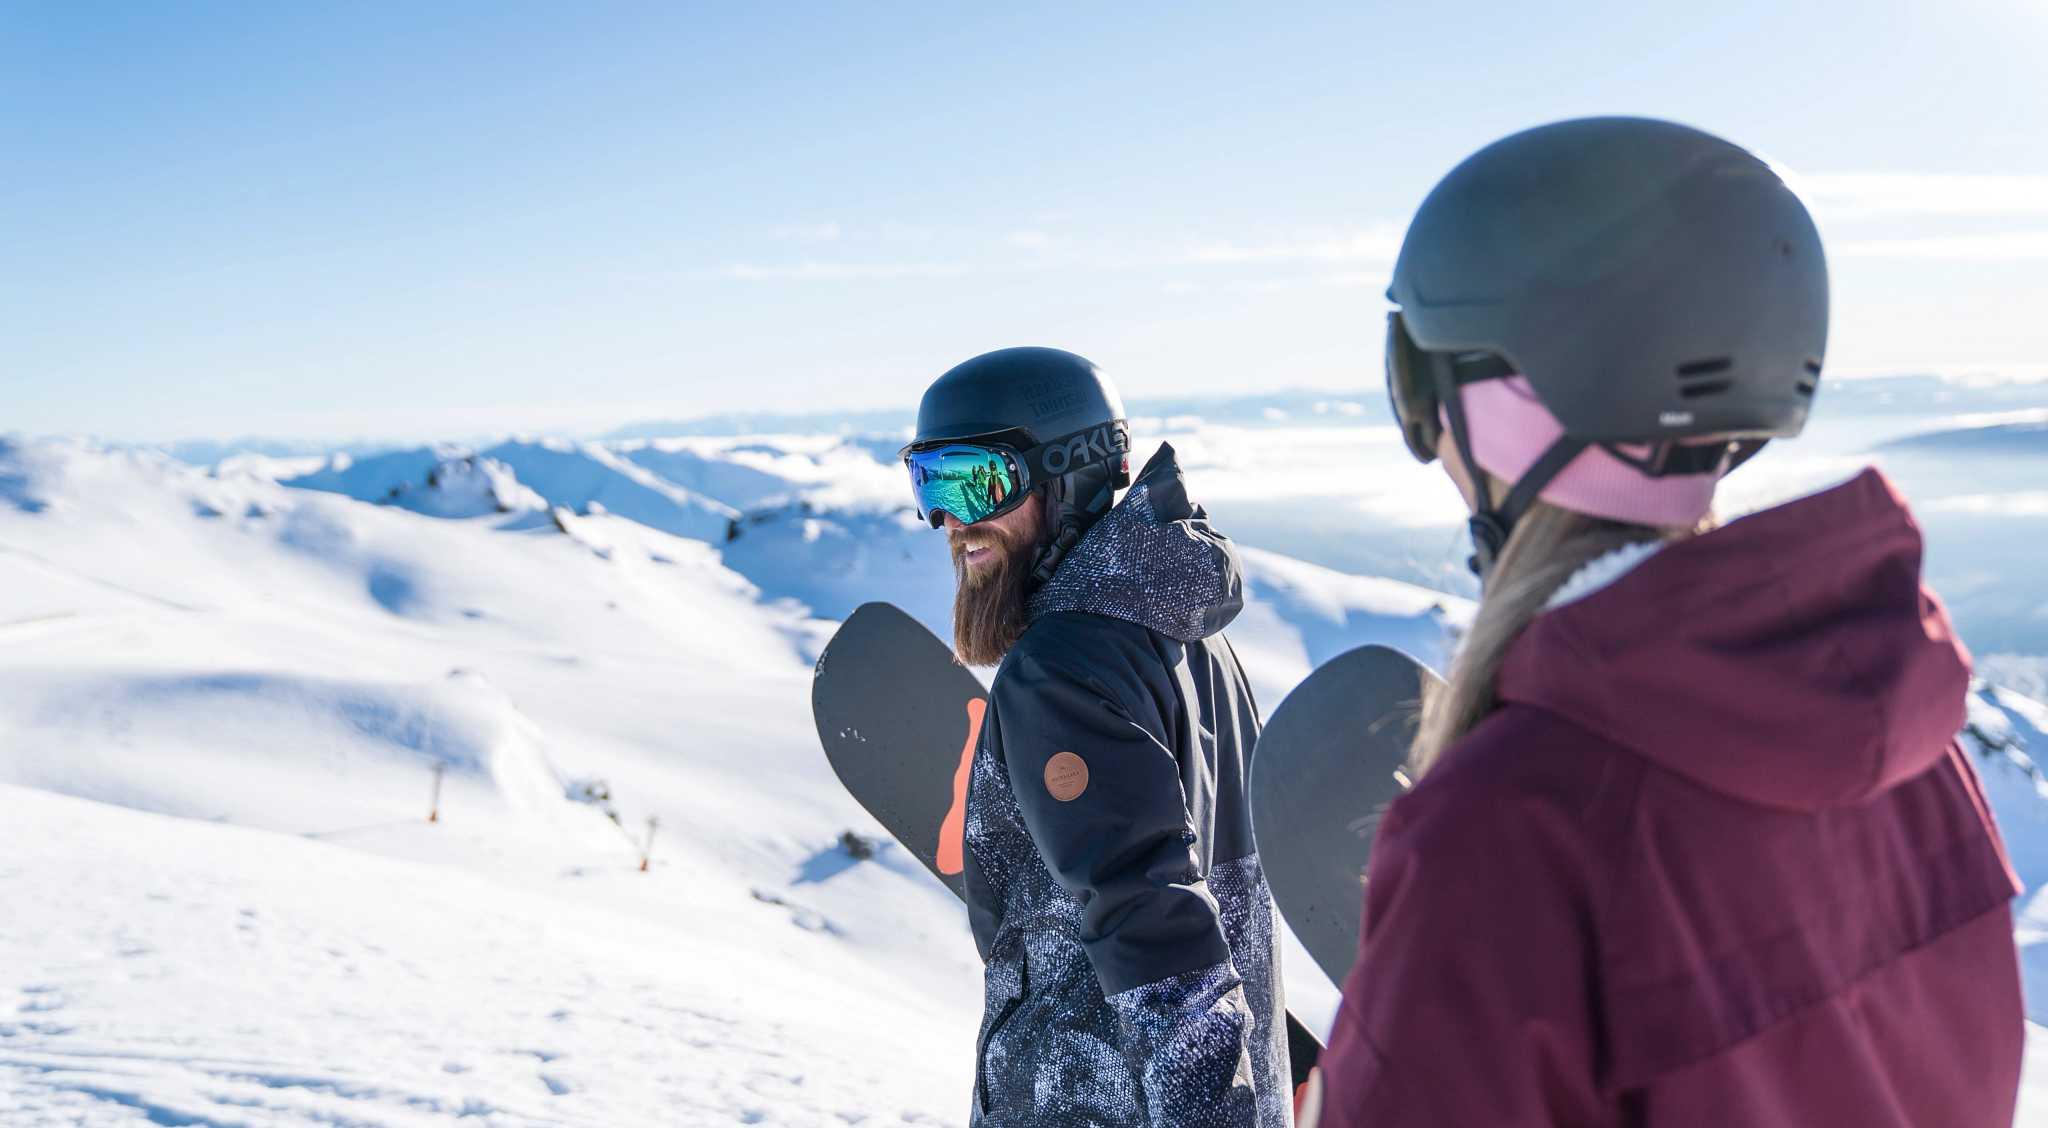 Cardrona Alpine Resort - Couple looking at view  - highres.jpg